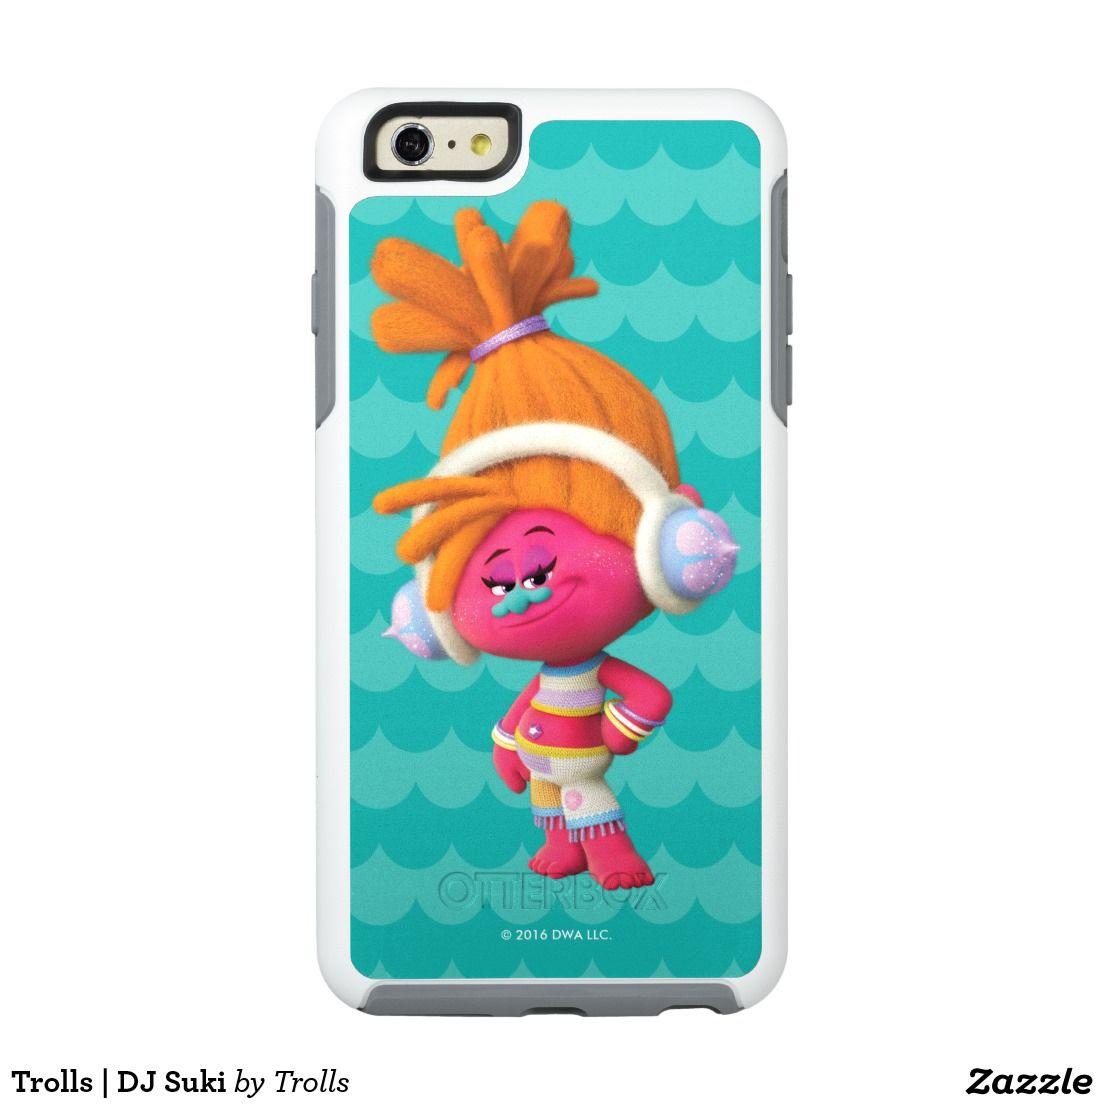 Trolls Dj Suki Otterbox Iphone 6 6s Plus Case Broken Glass Circuit Board 5 Zazzle 7